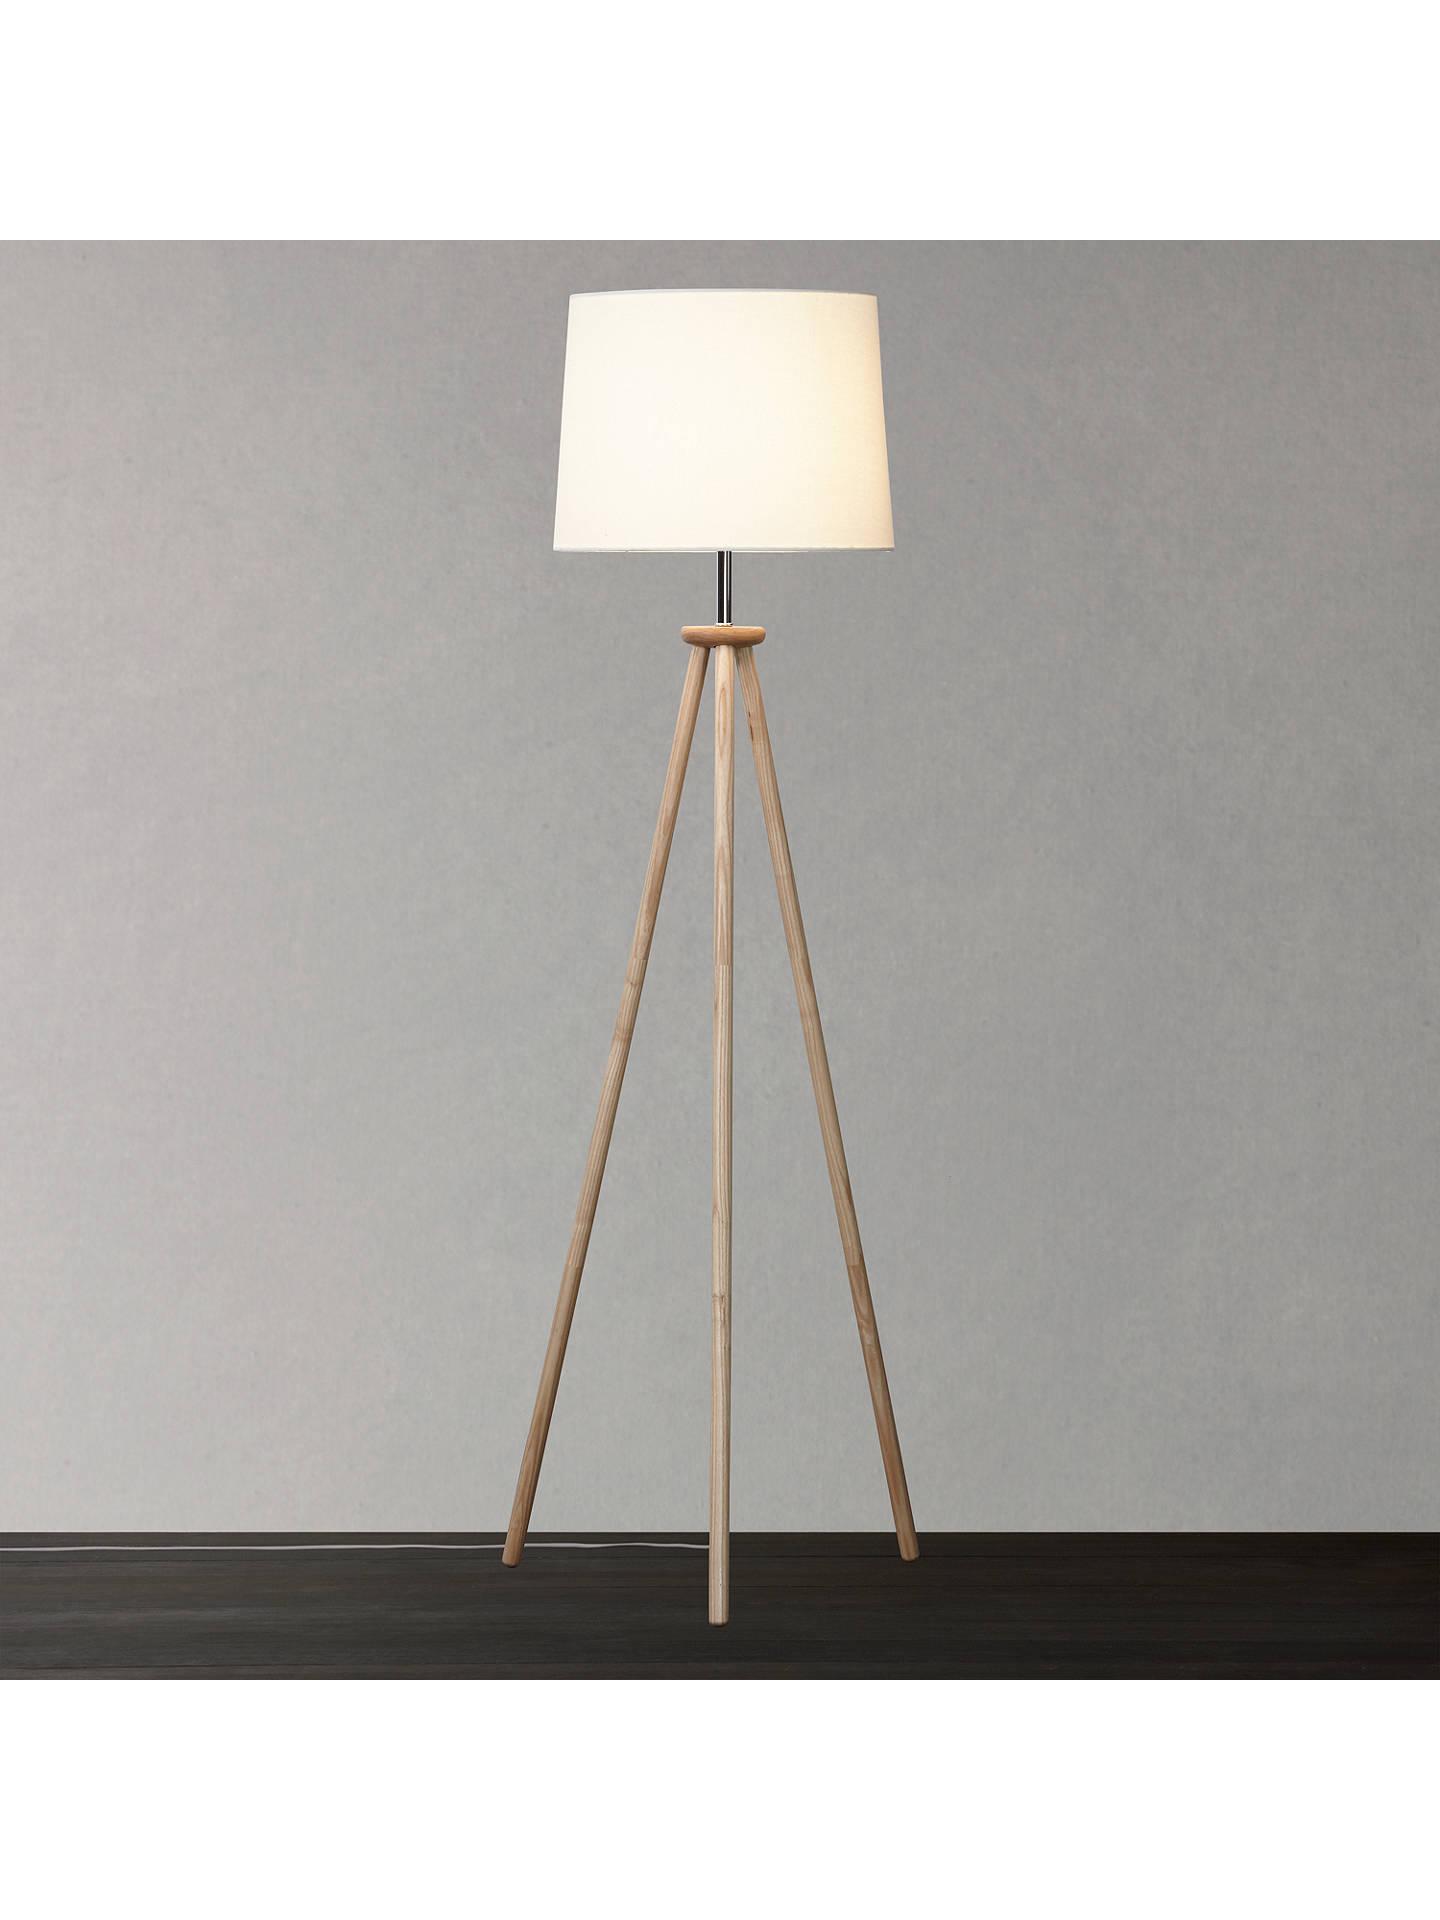 John Lewis Glen Tripod Floor Lamp, Ash at John Lewis & Partners